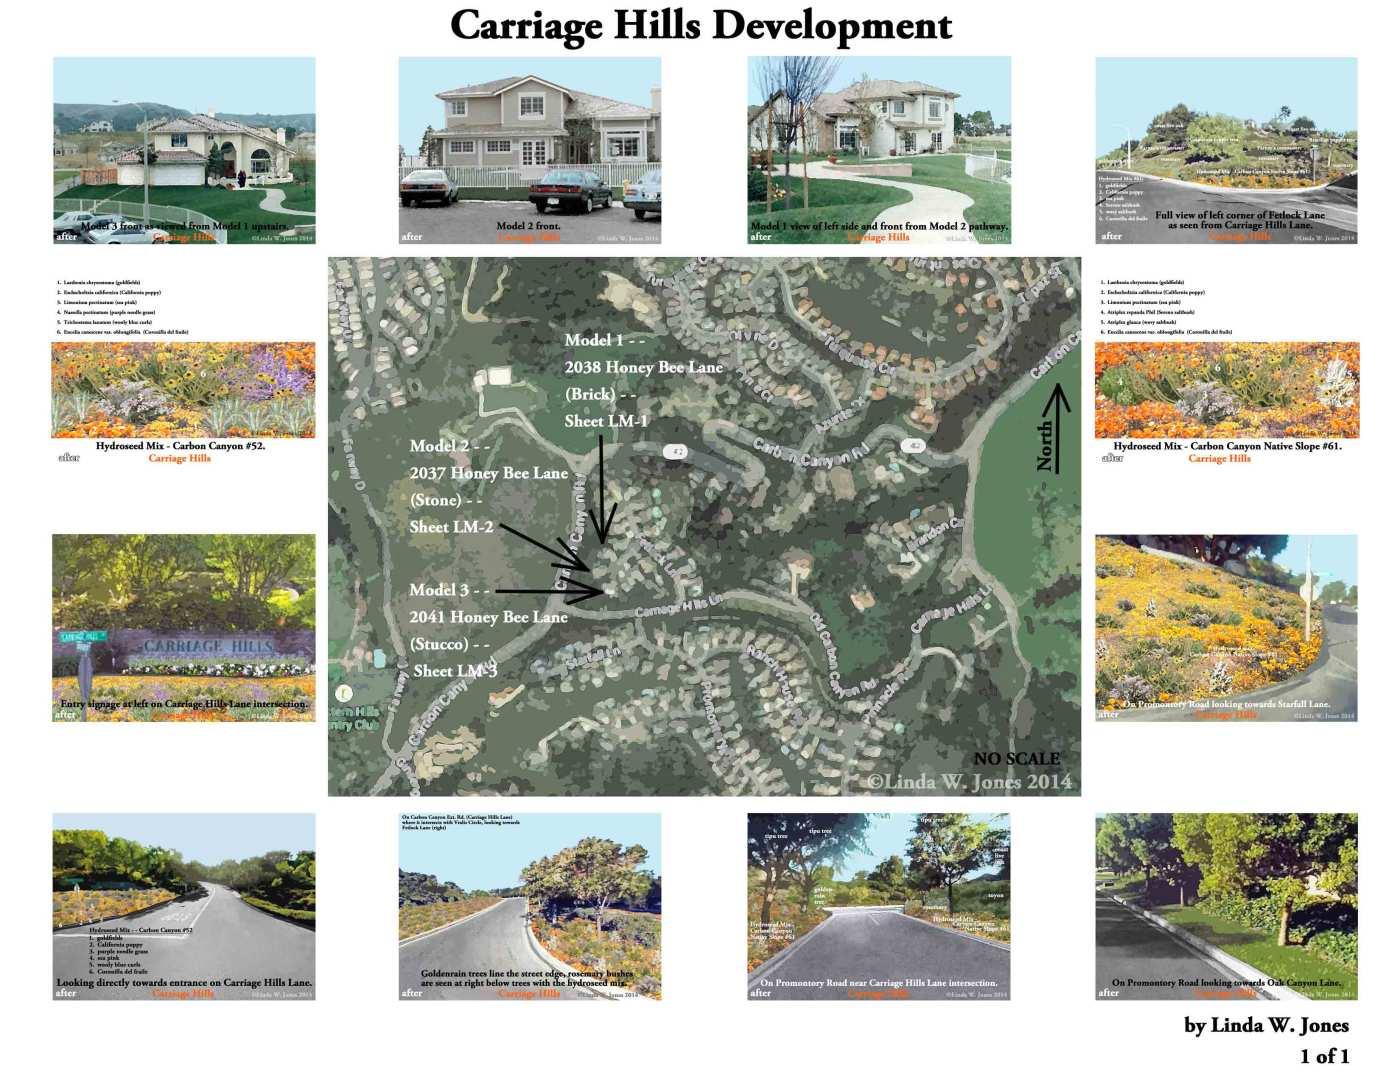 2.–Carriage-Hills-Develpment-lr030415